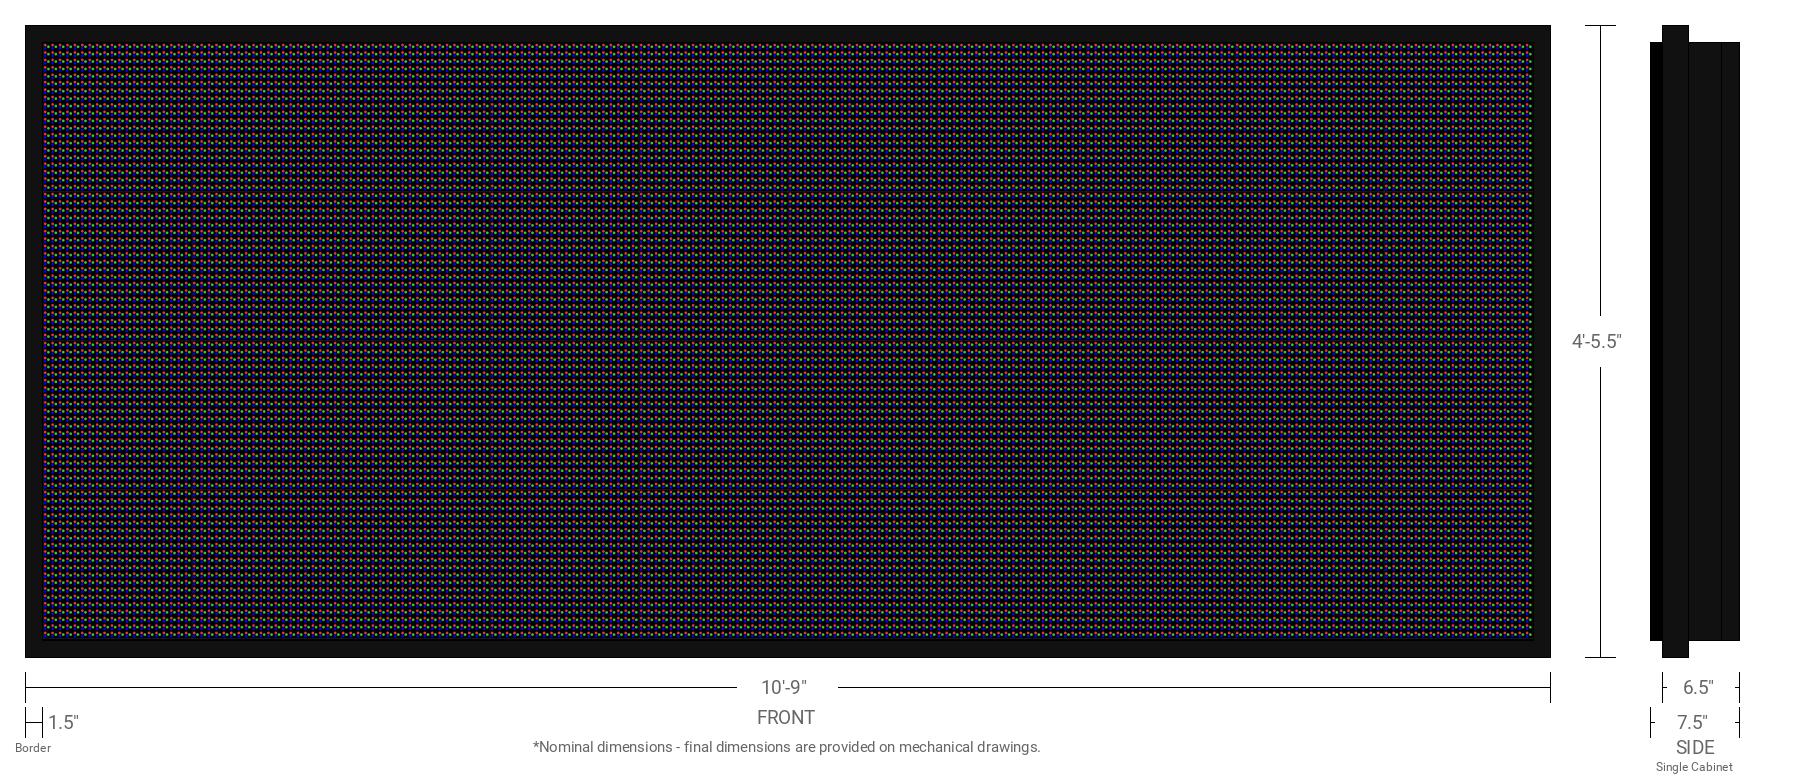 Polaris 16mm 80x200 Single Sided Full Color LED Display